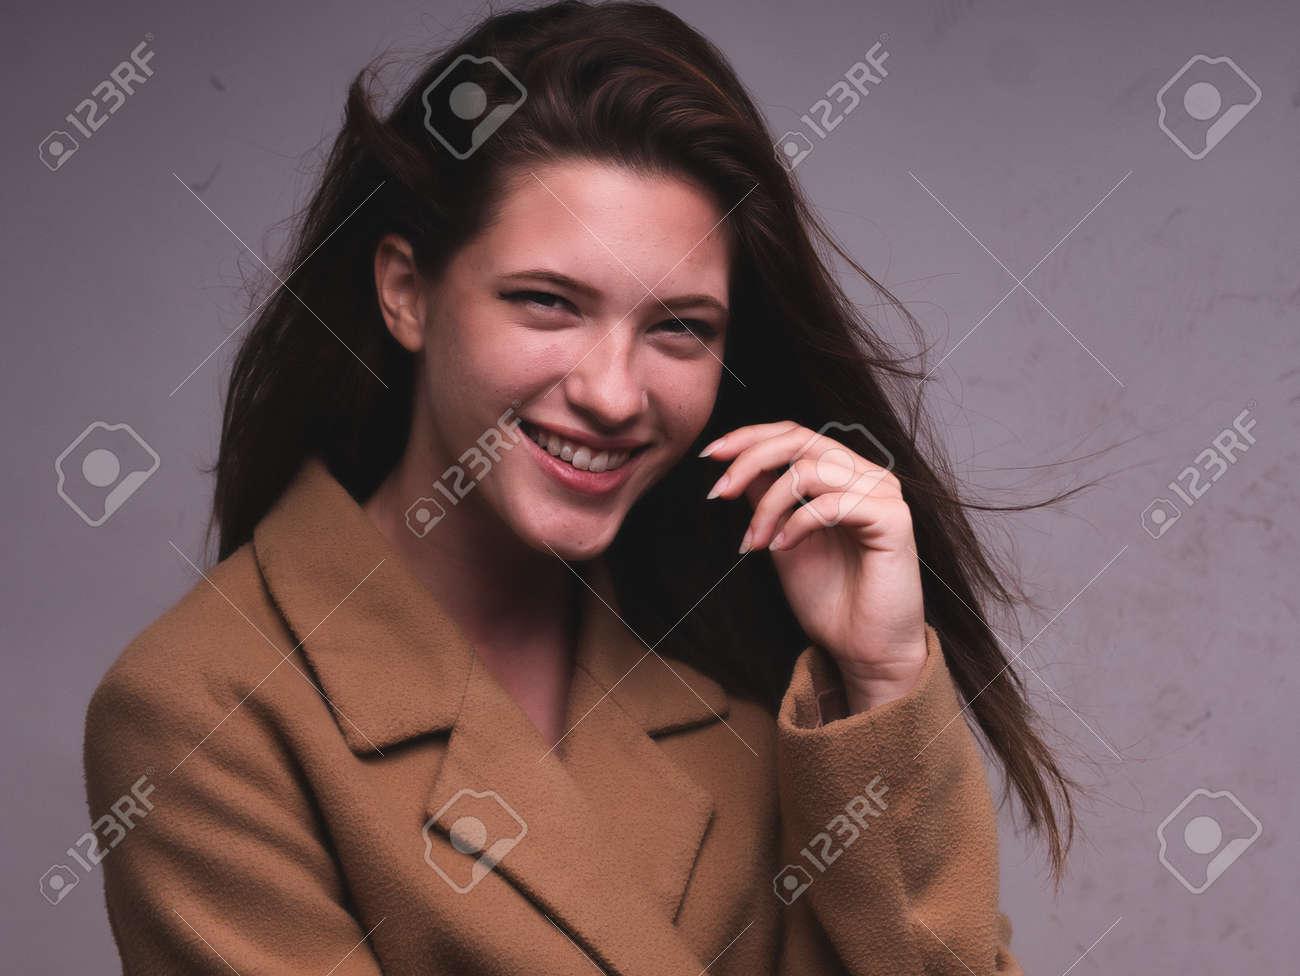 high key. Conceptual portrait with plastic sheets. One young woman strugling with plastic sheets. - 164118922